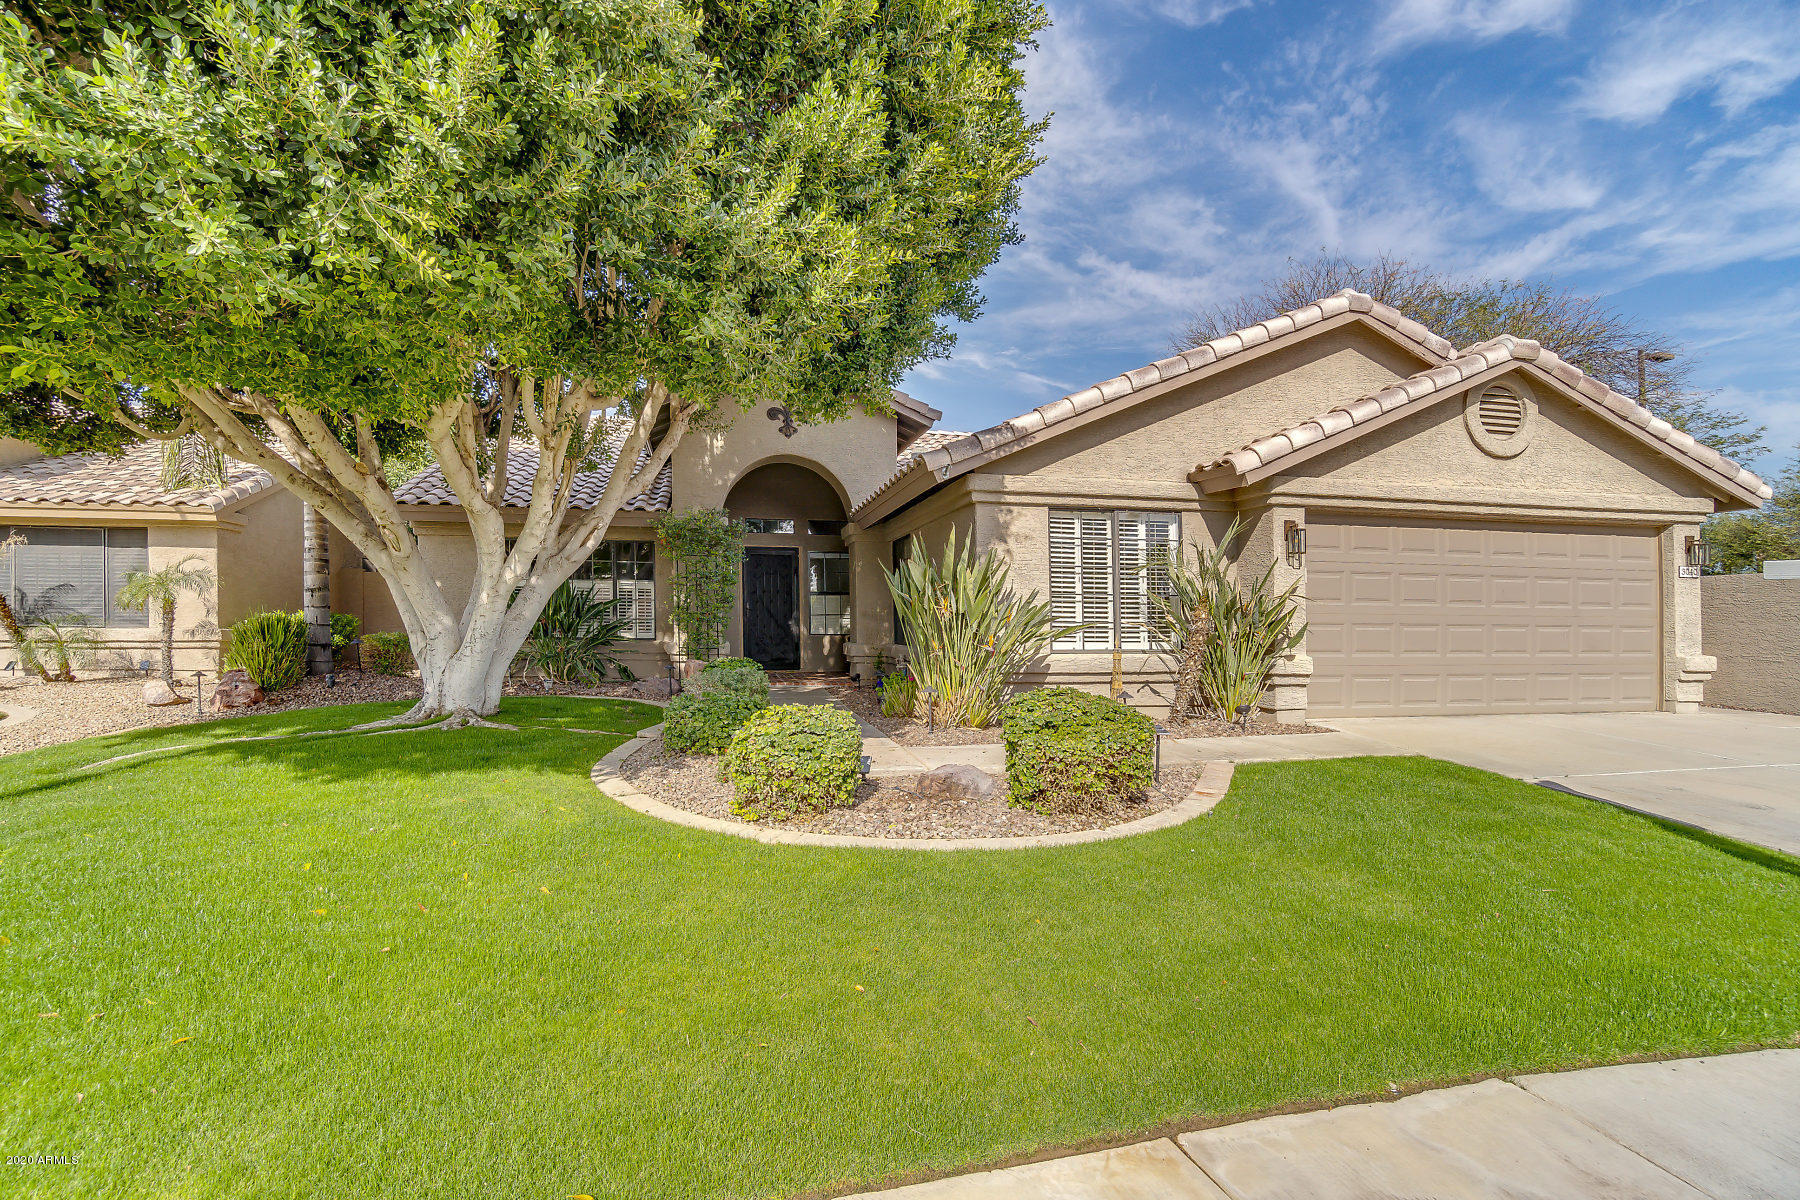 Photo of 3040 S Rosemary Drive, Chandler, AZ 85248